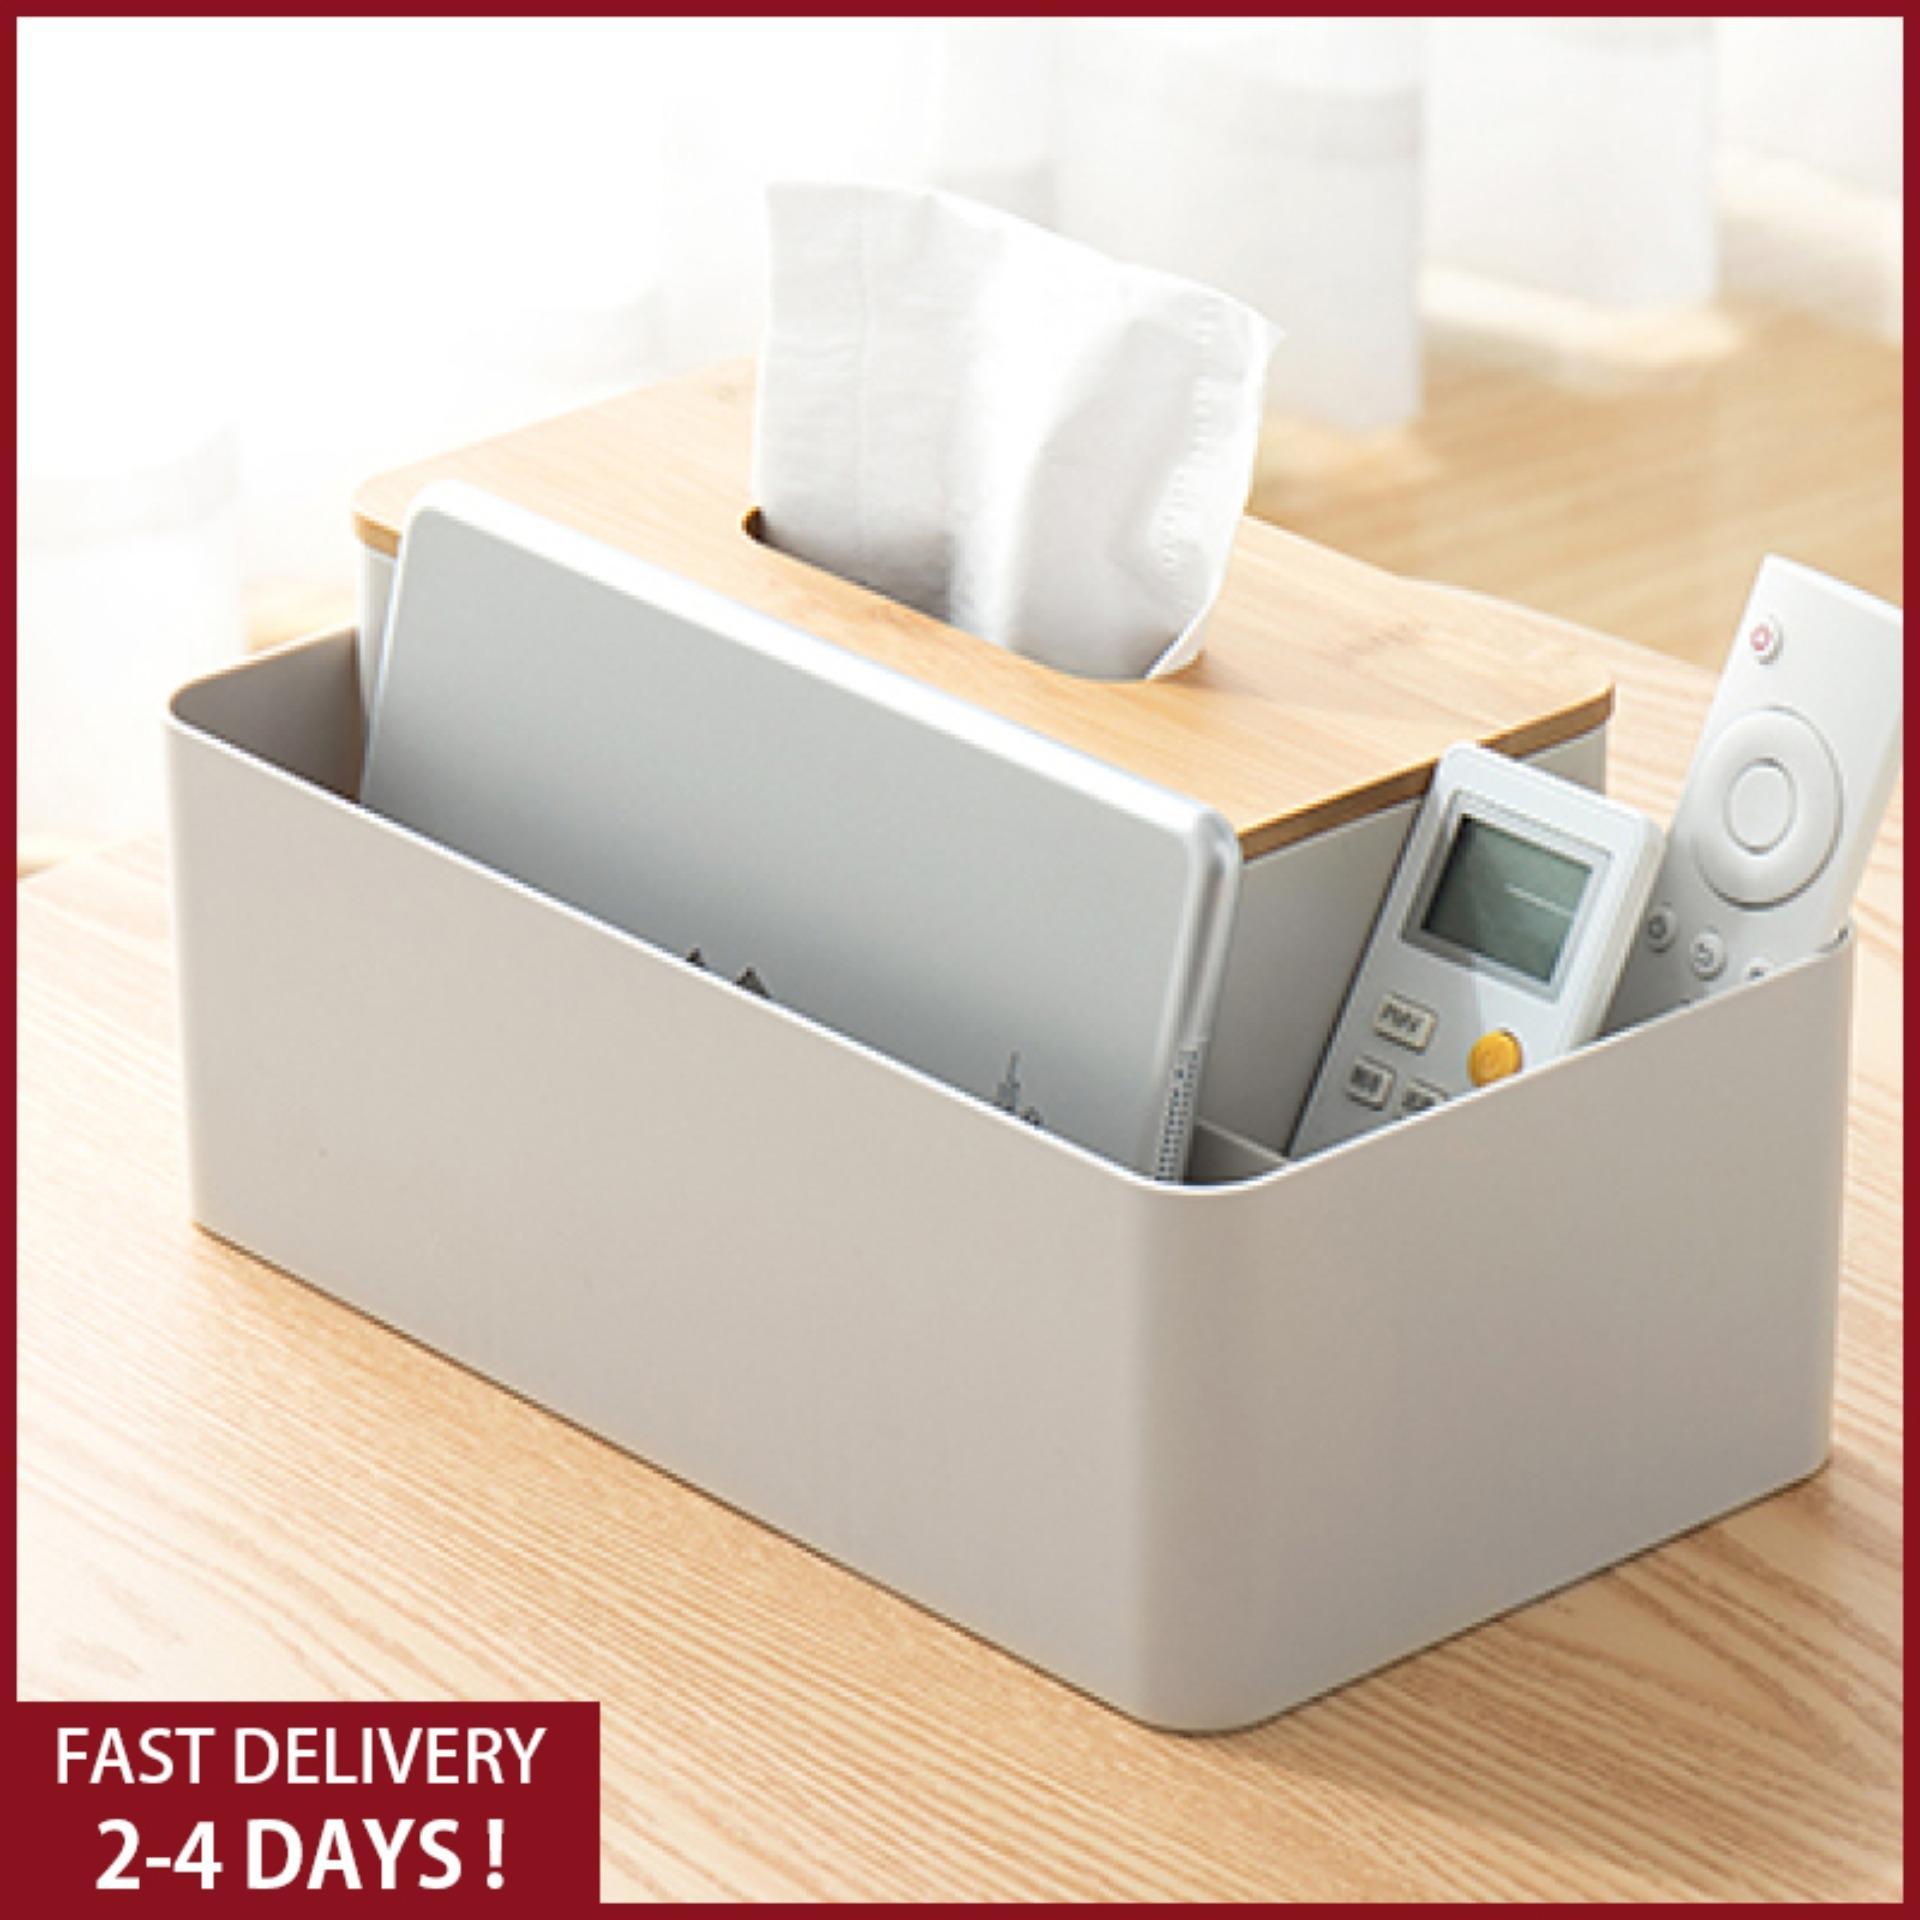 Bamboo Cover tissue Box holder Creative Desktop Pumping Paper Home Living Room Remote Control Storage tissue Box organizer